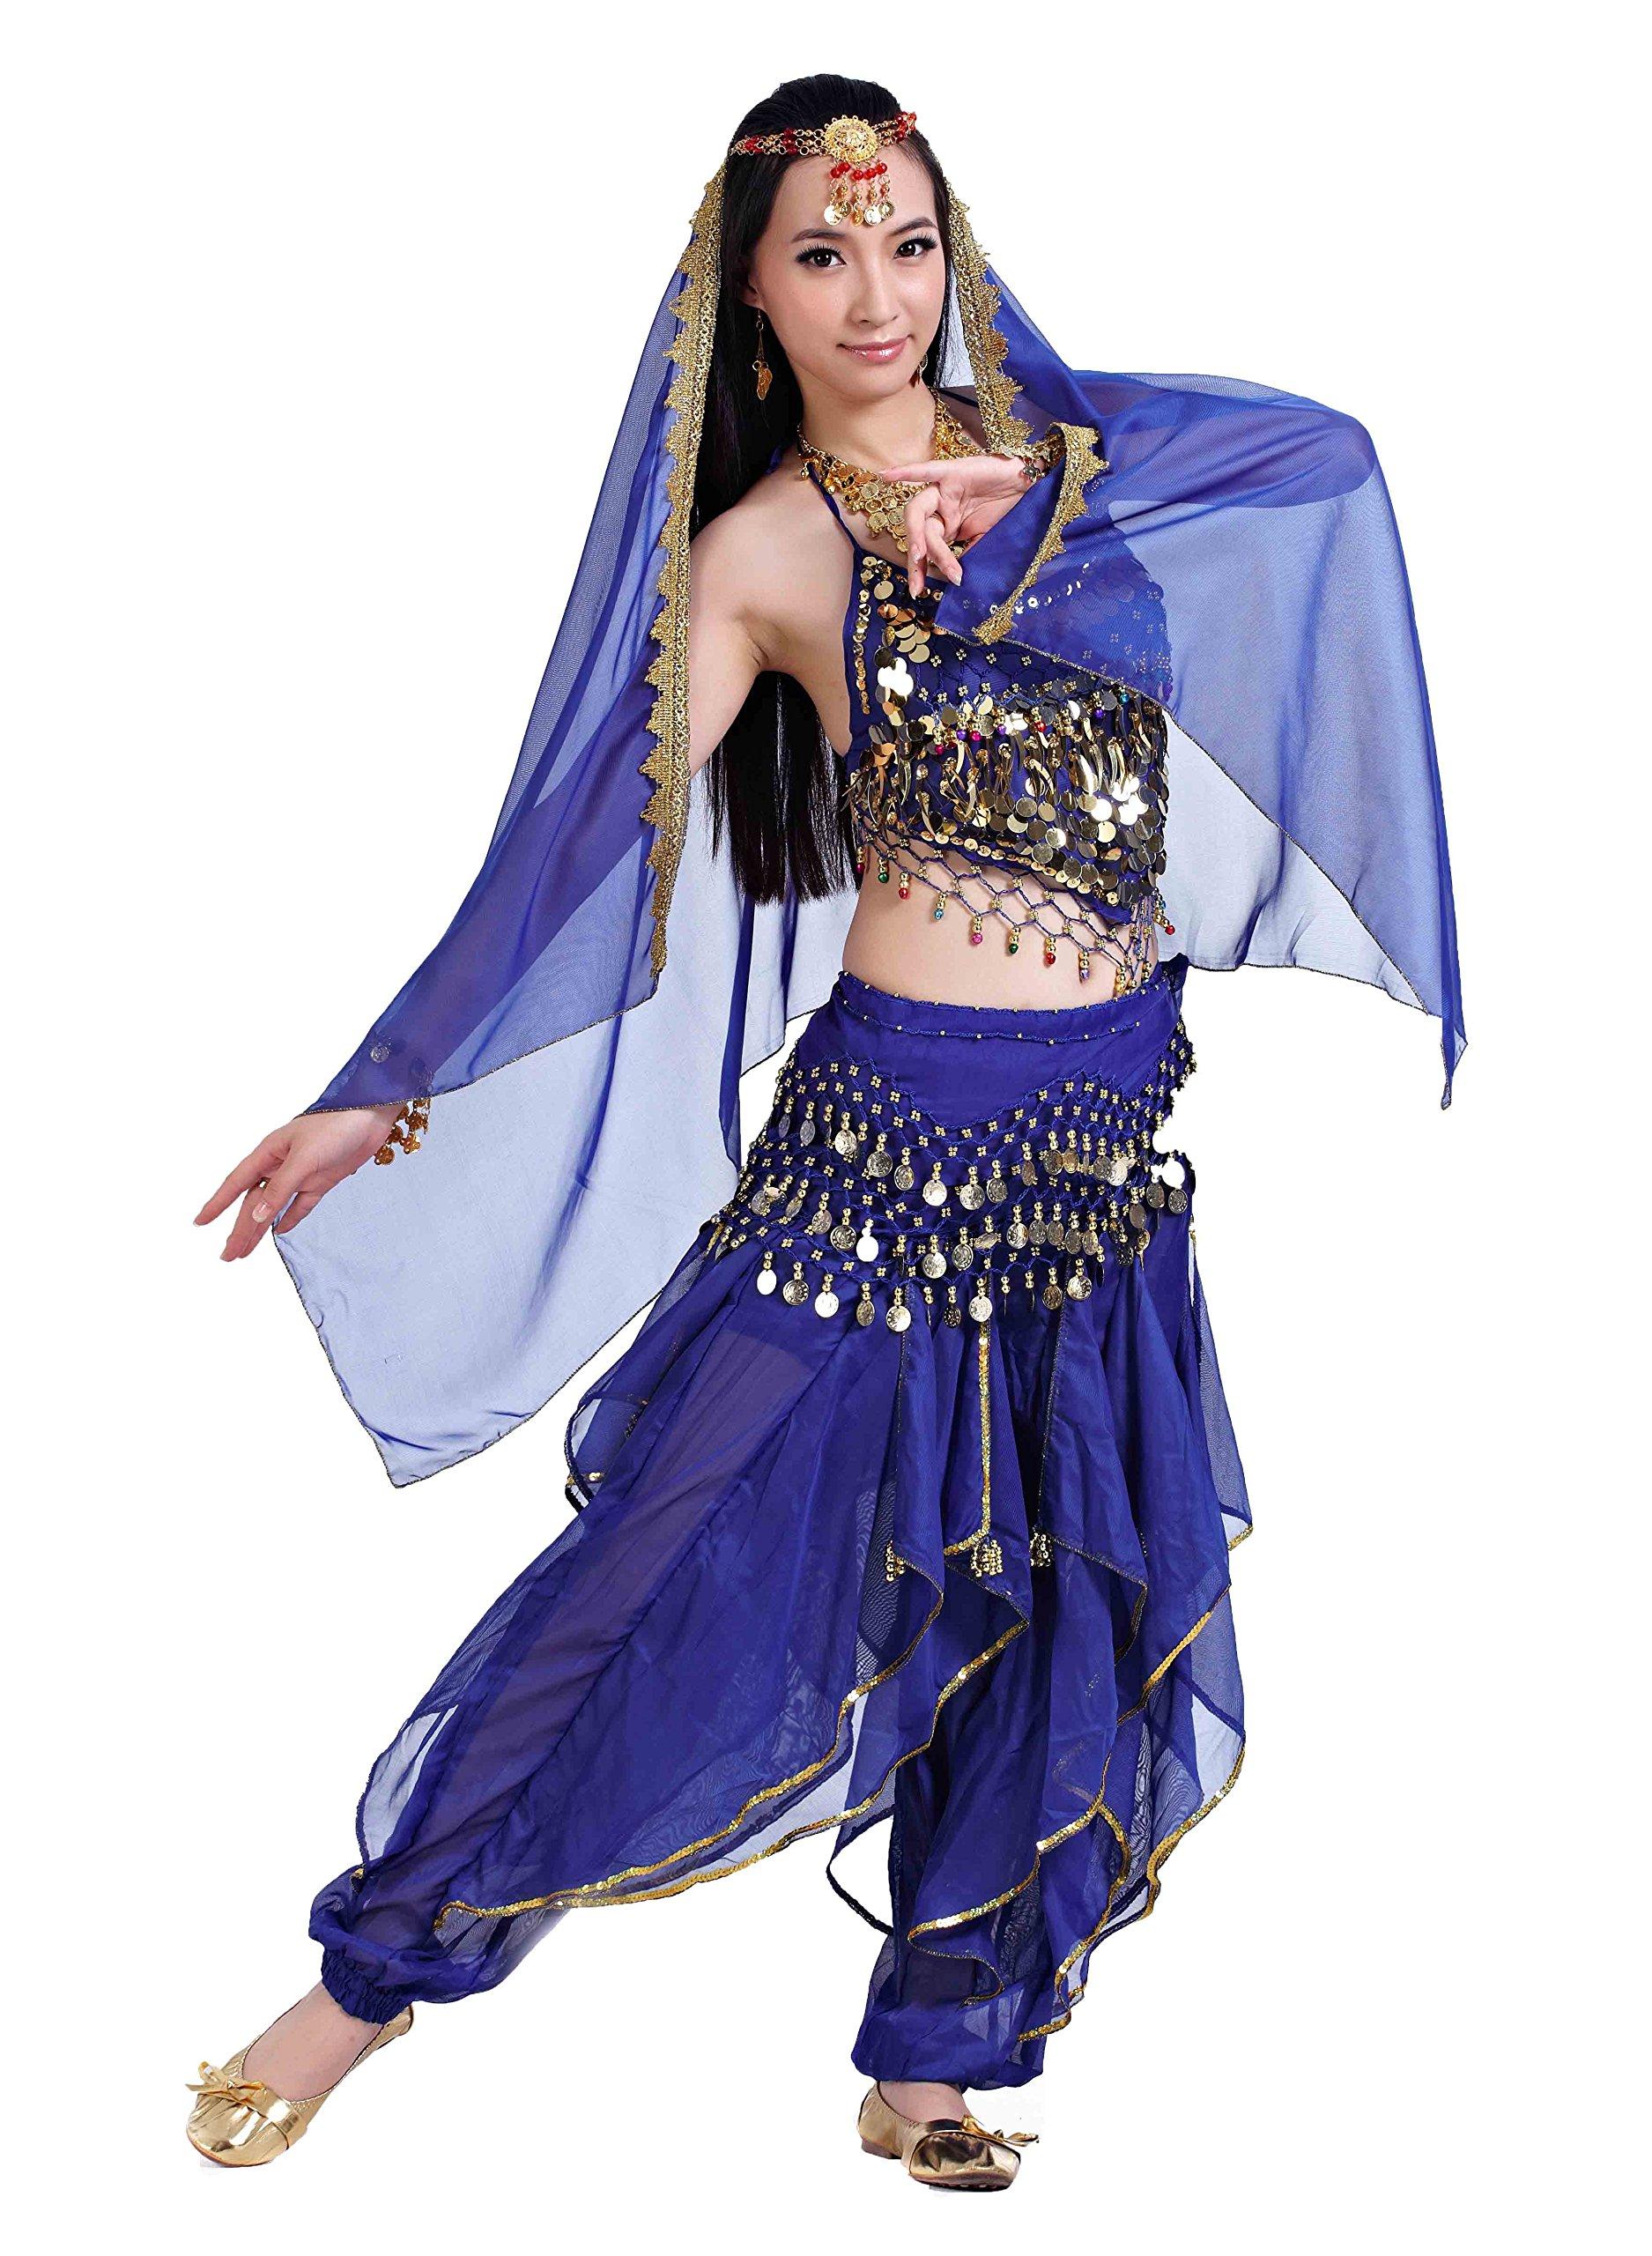 7c27b58d2581 Seawhisper 12 Colors Belly Dance India Arab Dance Halloween Carnival Costume  Set Sc 1 St Amazon UK